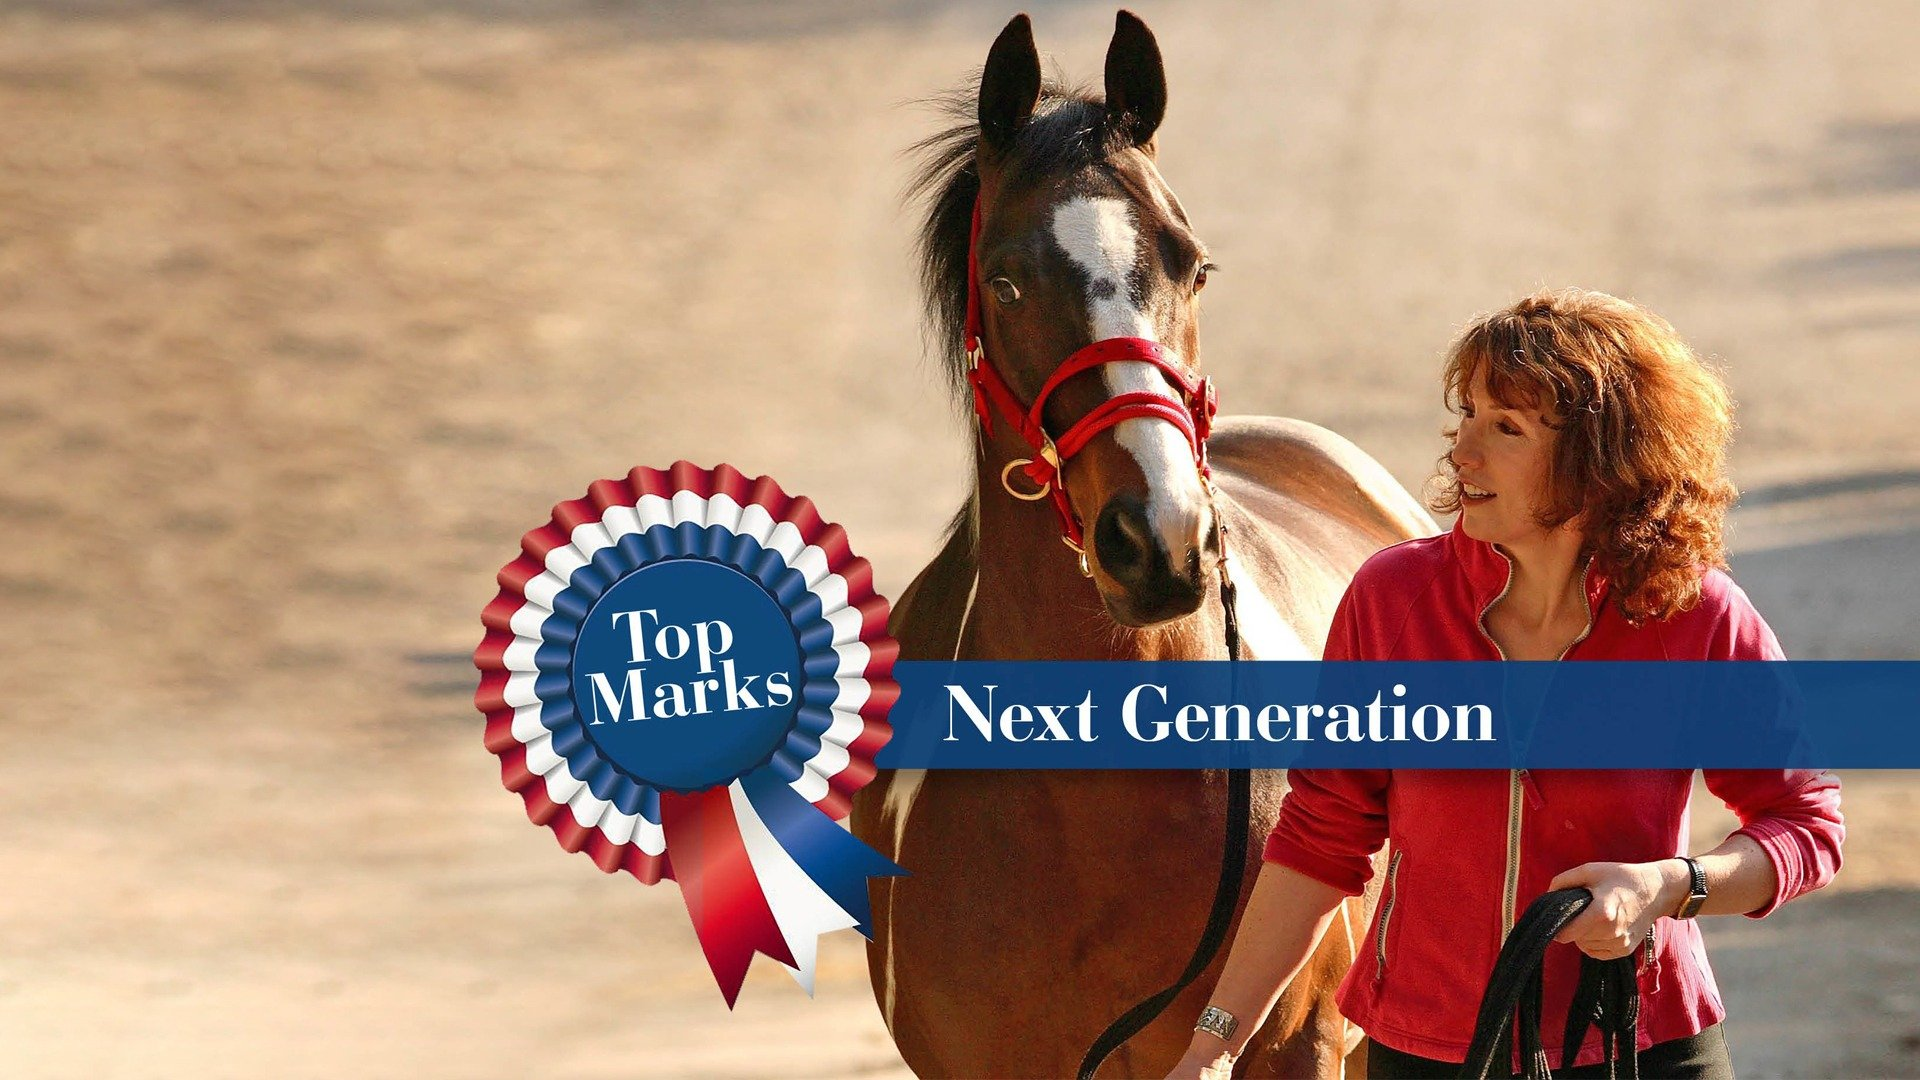 Top Marks: Next Generation